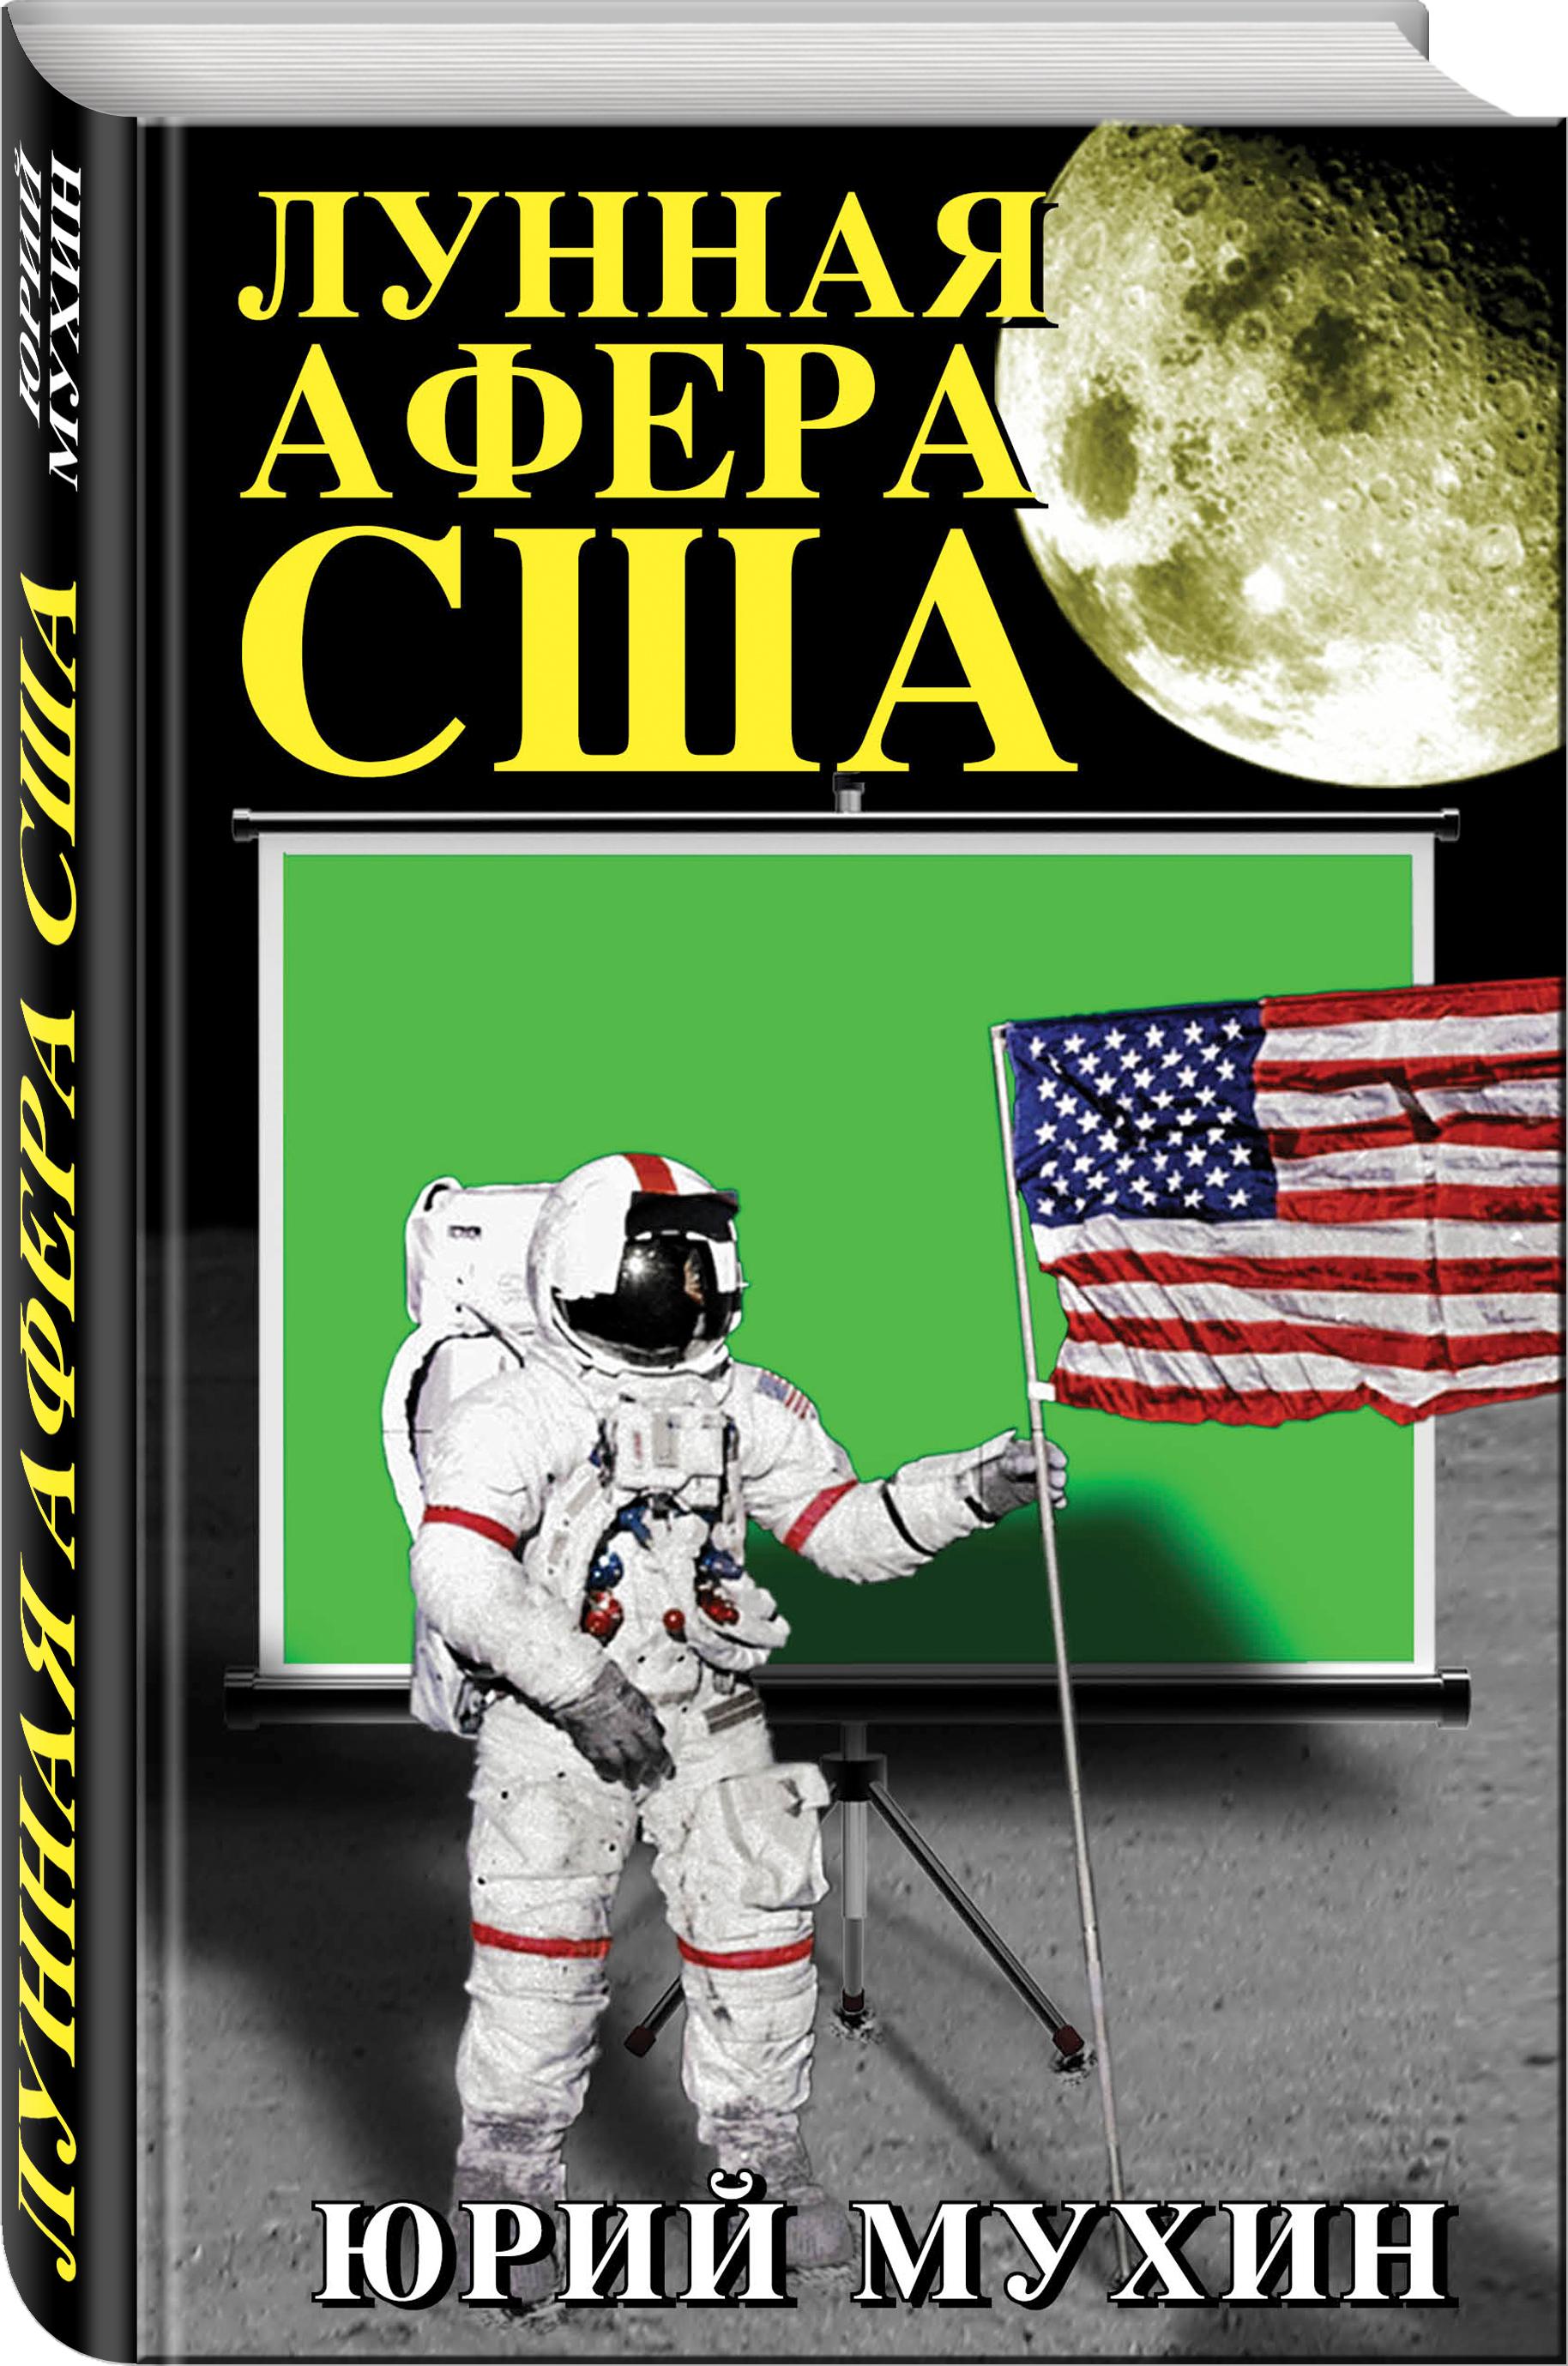 Мухин Ю.И. Лунная афера США афера века